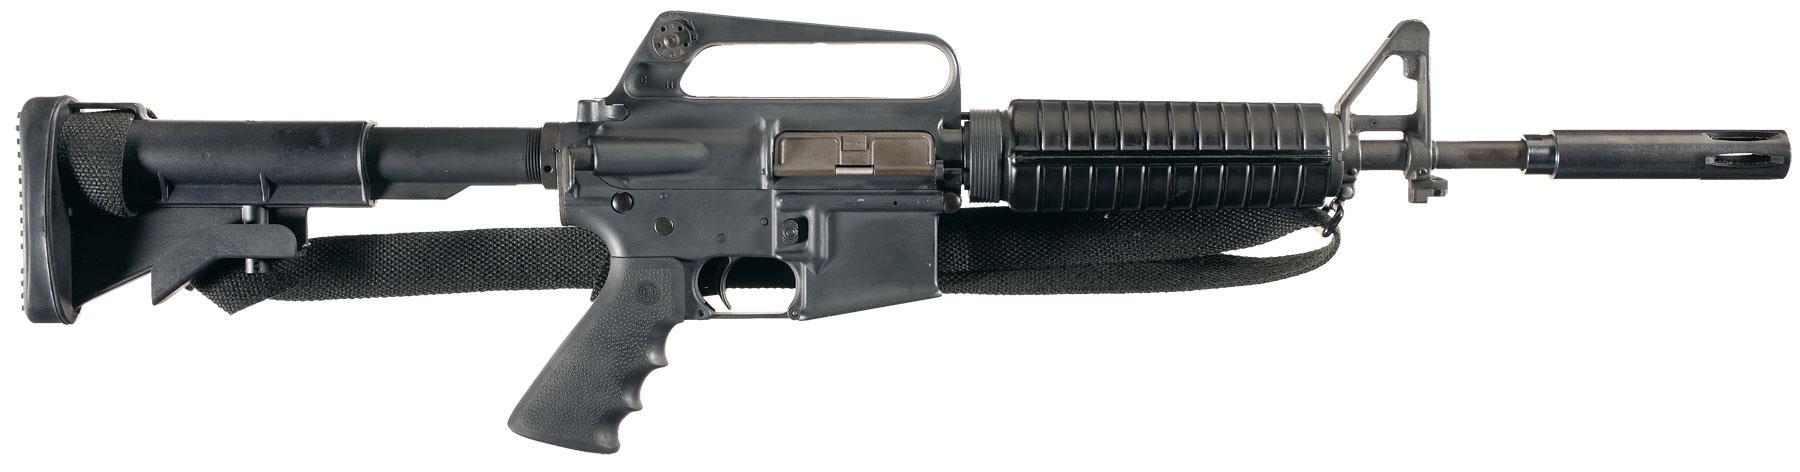 Rare Original Colt M16A1 Class III Registered Fully Automatic Ca